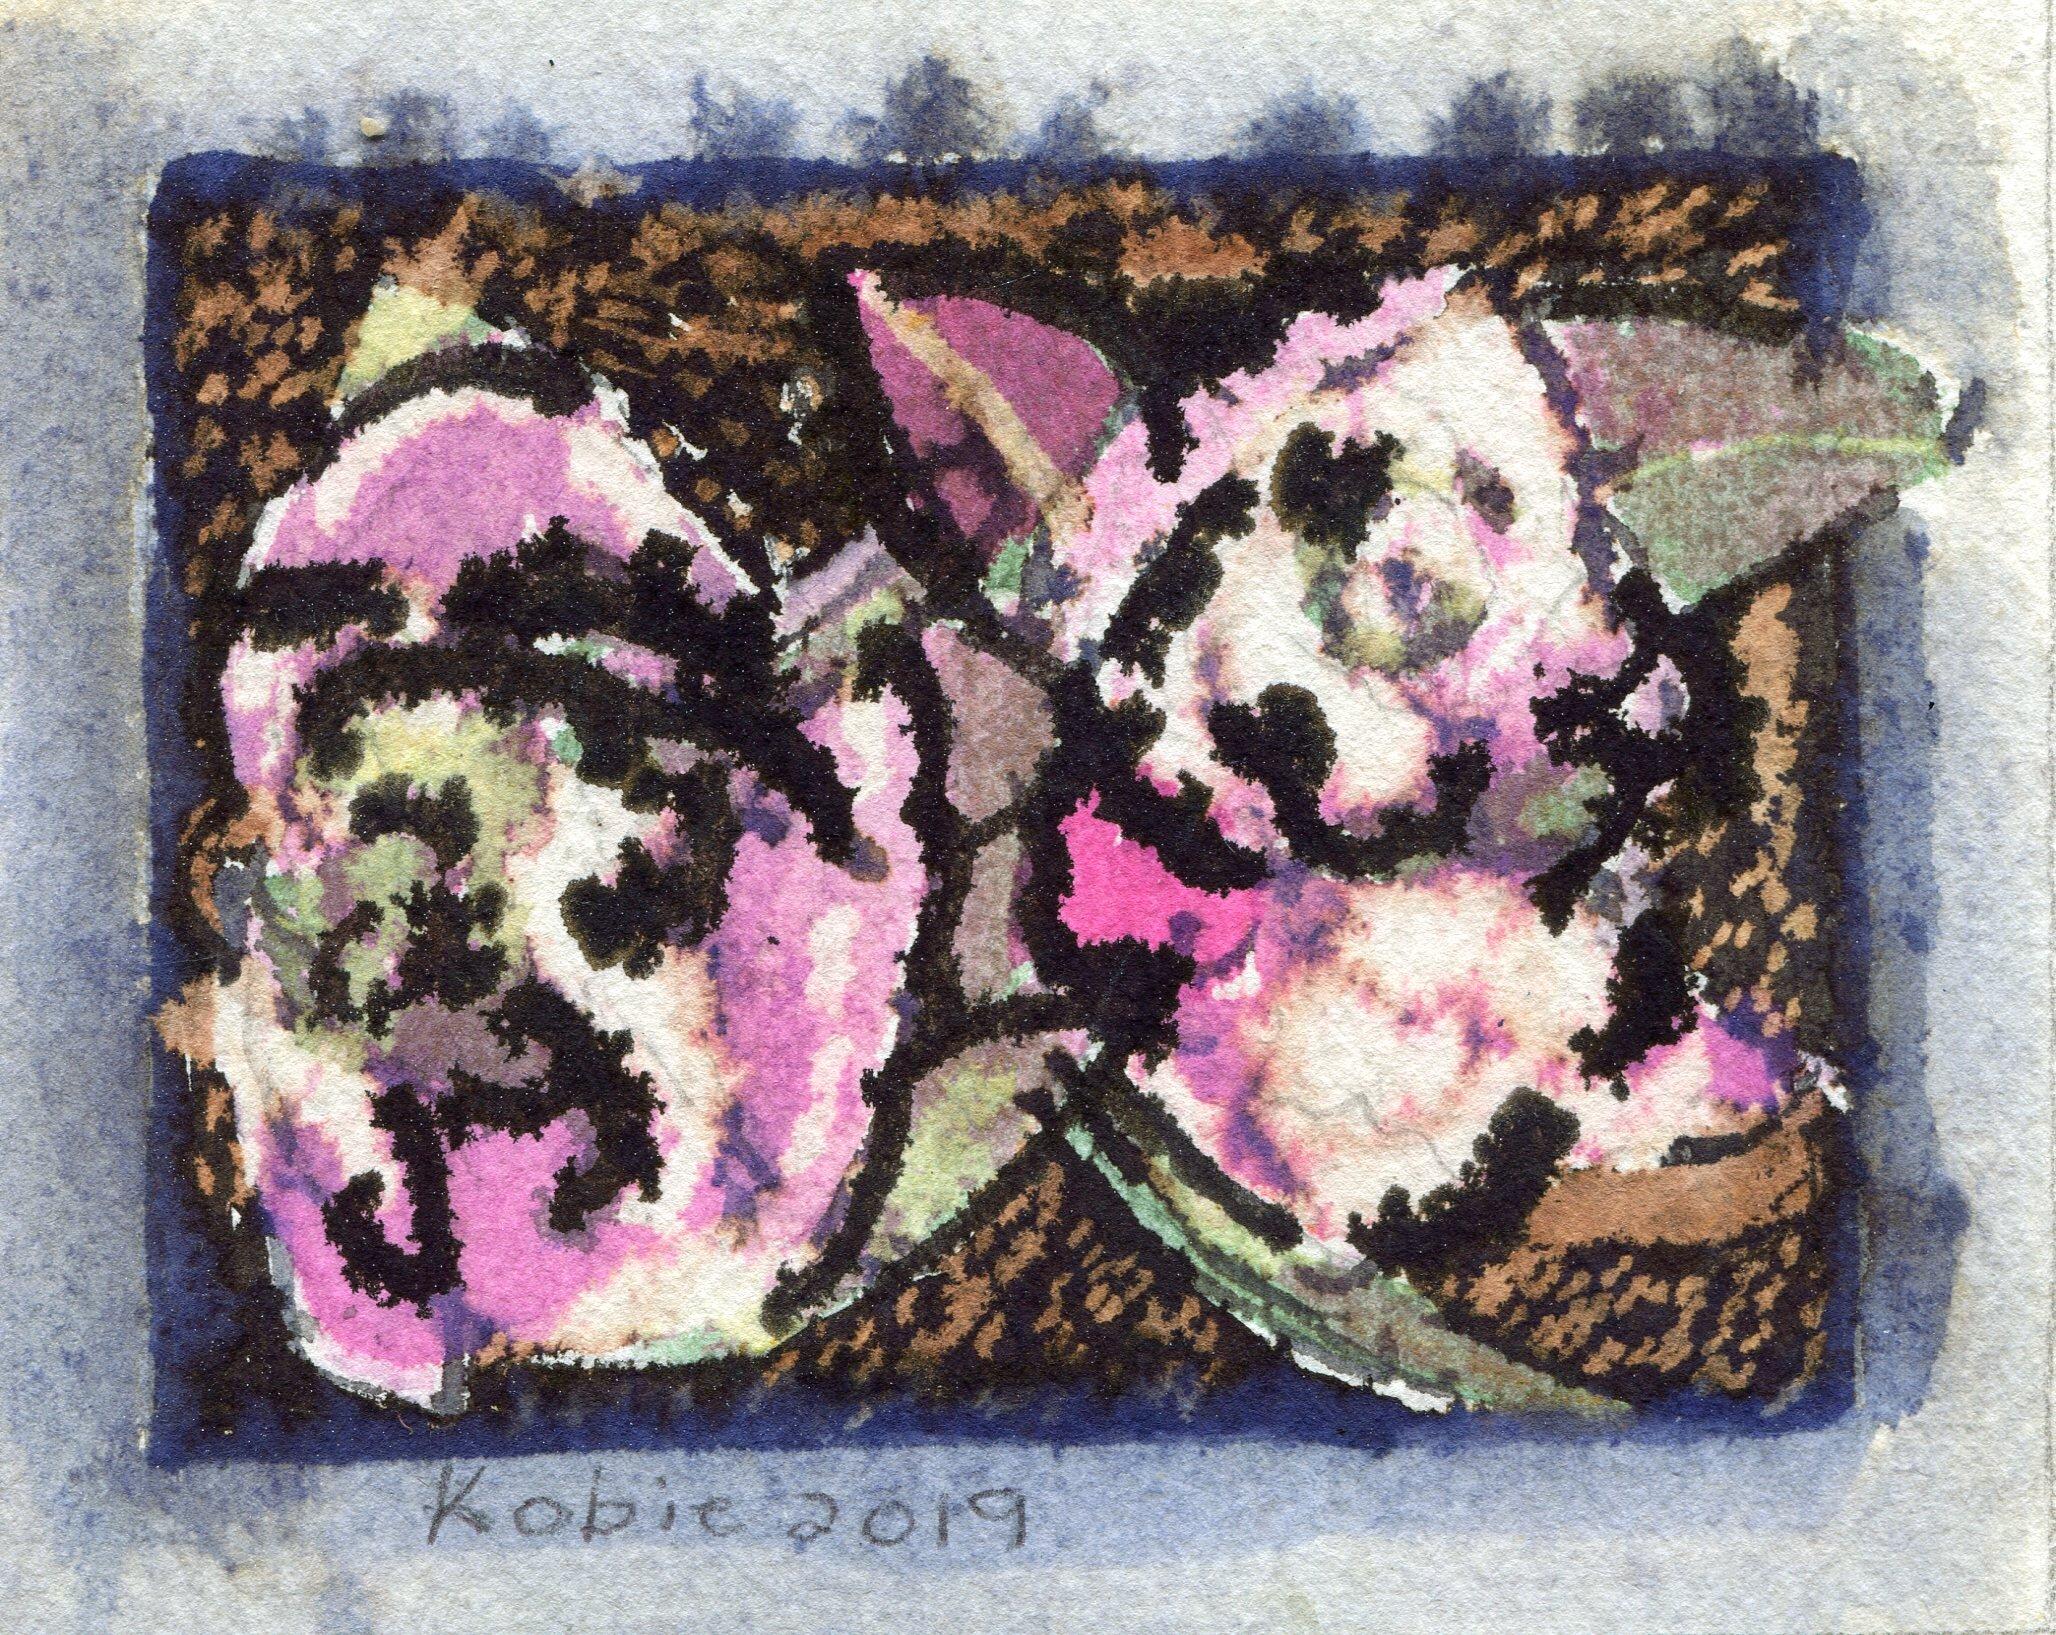 50b  Kobie Venter  Camellia 2  ink drawing on paper